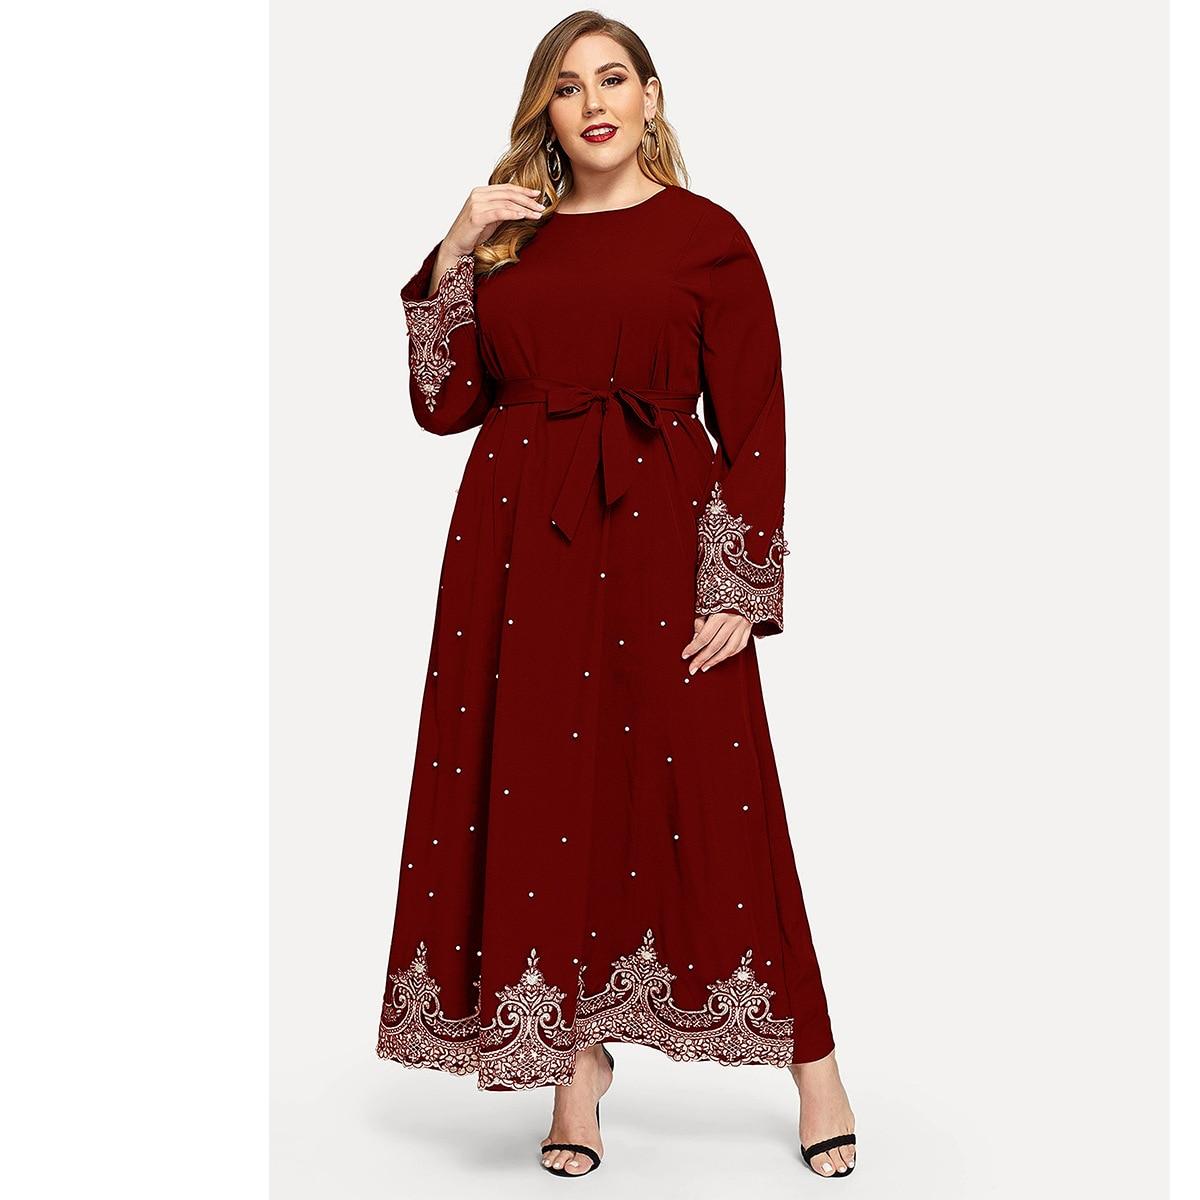 Wepbel, Abaya bordado con cuentas, vestido turco de manga larga de talla grande para mujer de Ramadán, vestido musulmán, Kimono caftán de marcaín